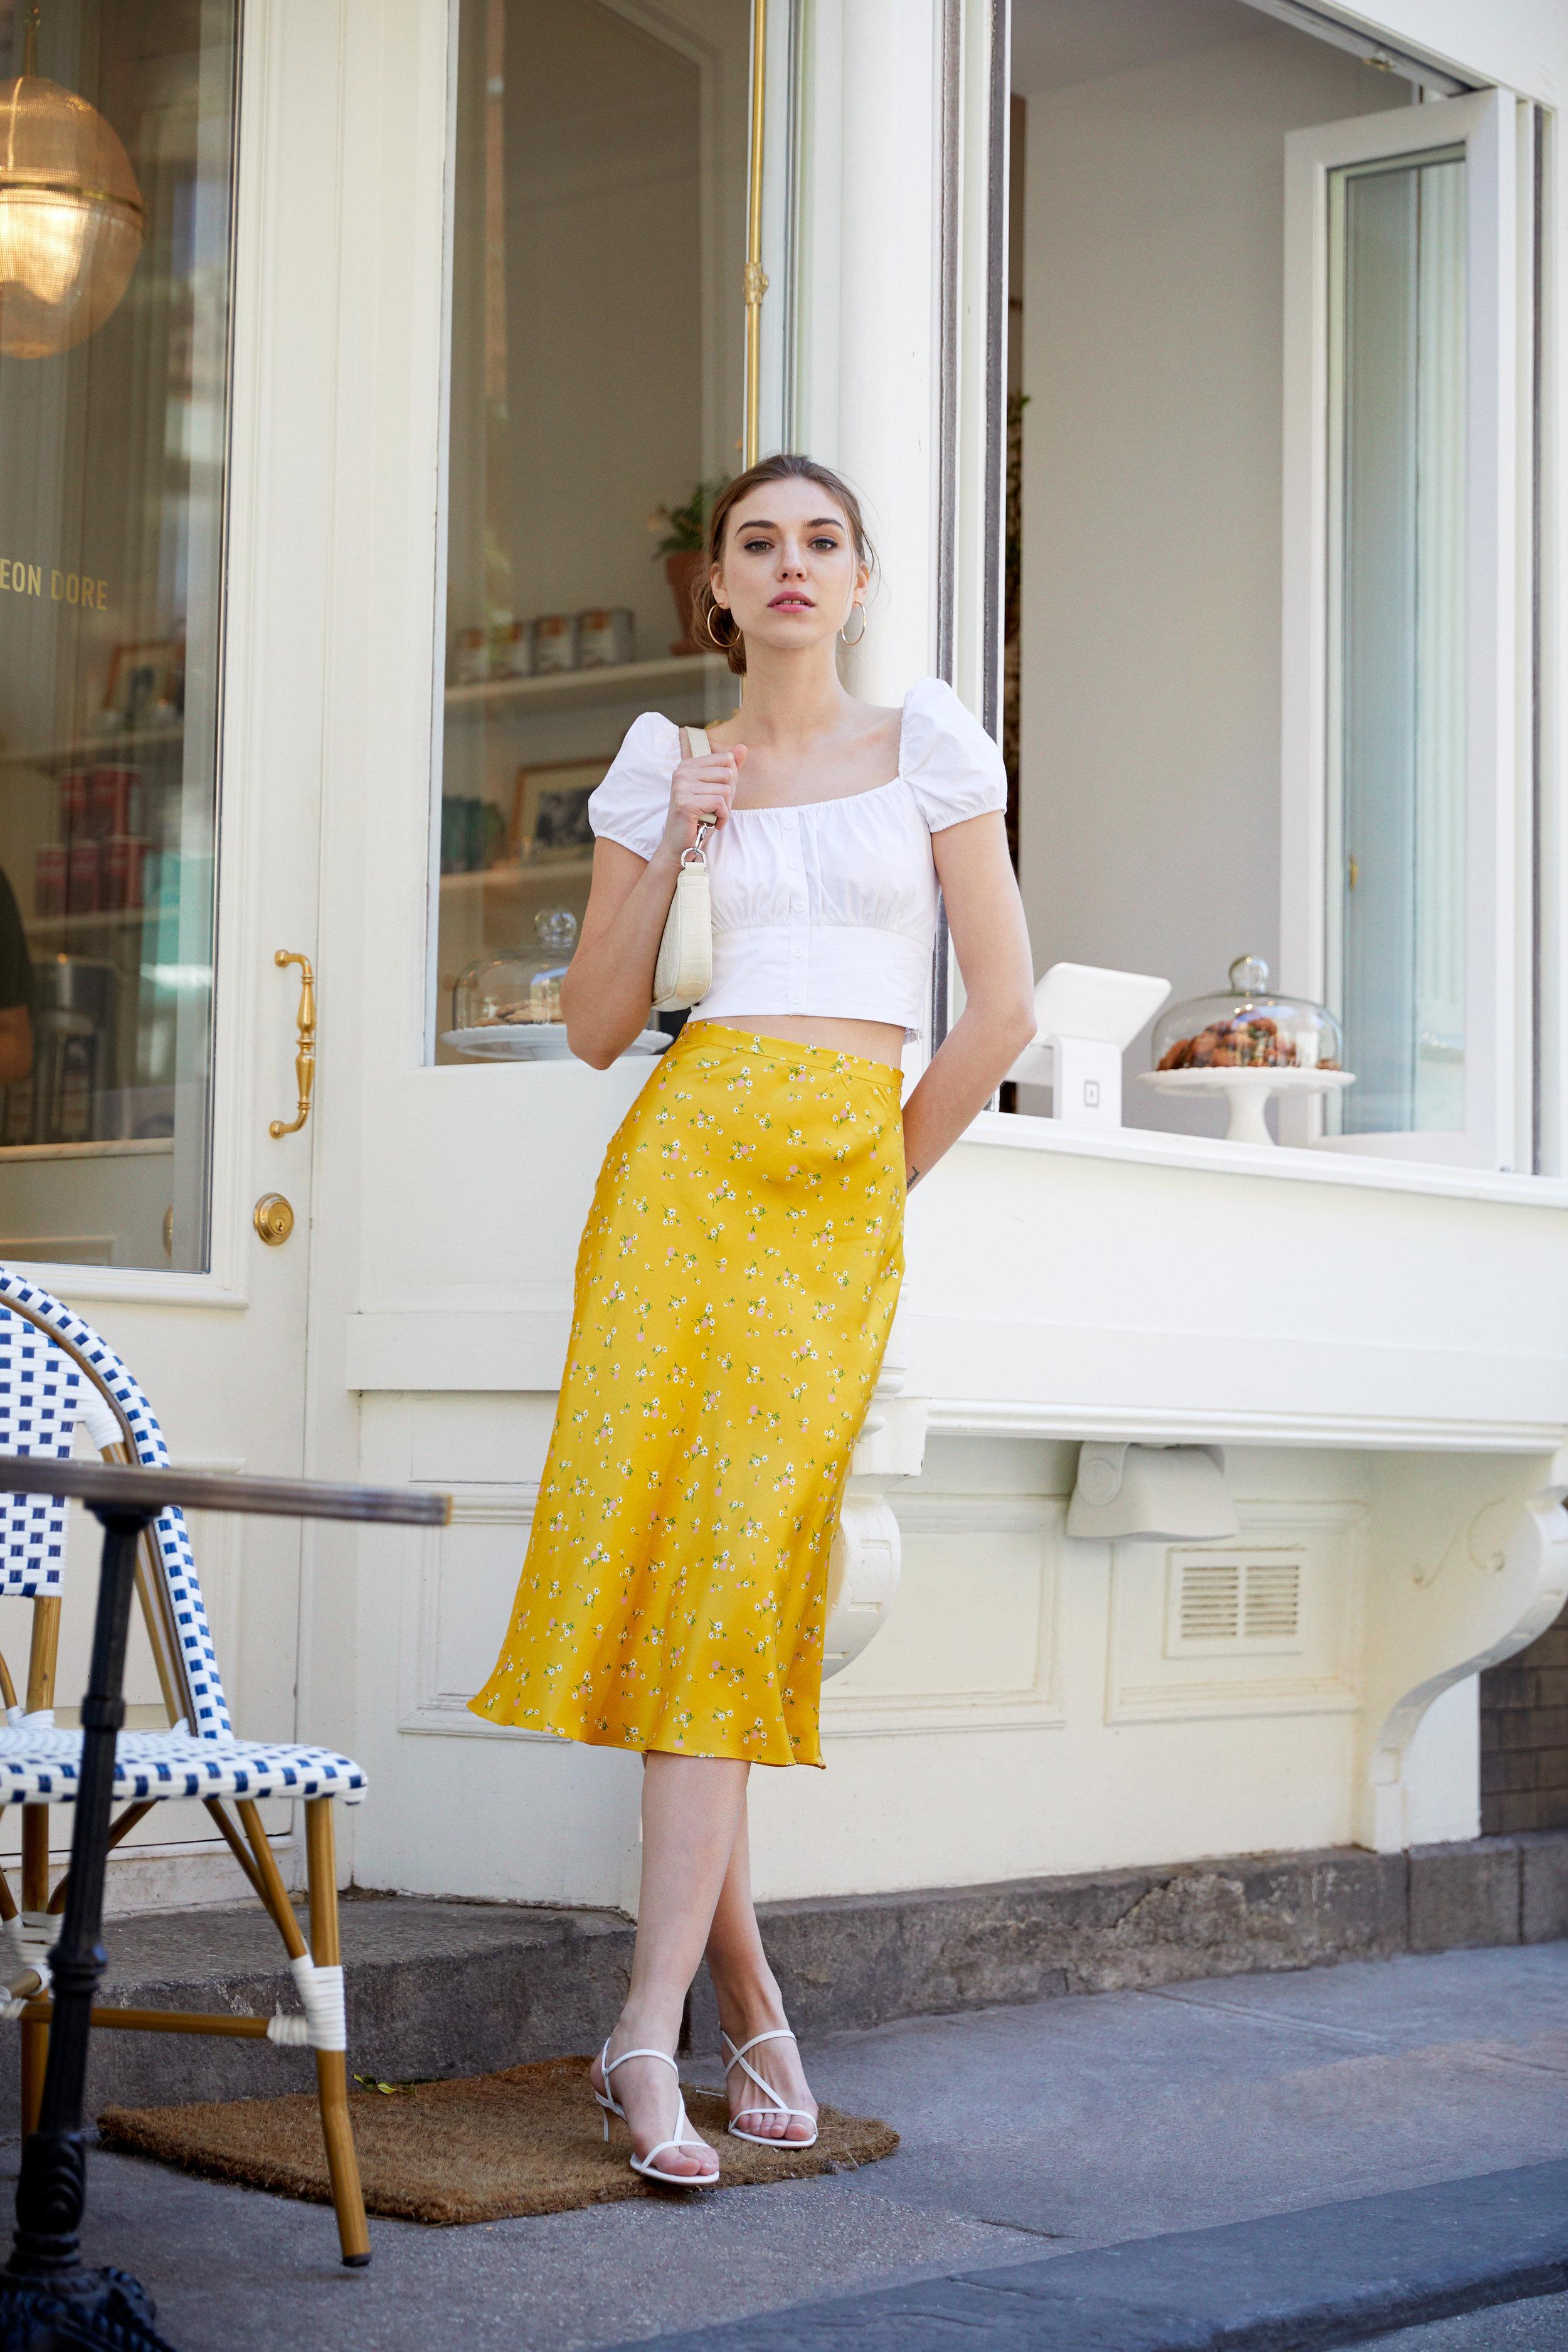 Only In Paris Floral Midi Skirt & Rachel Cream Croco Embossed Leather Bag